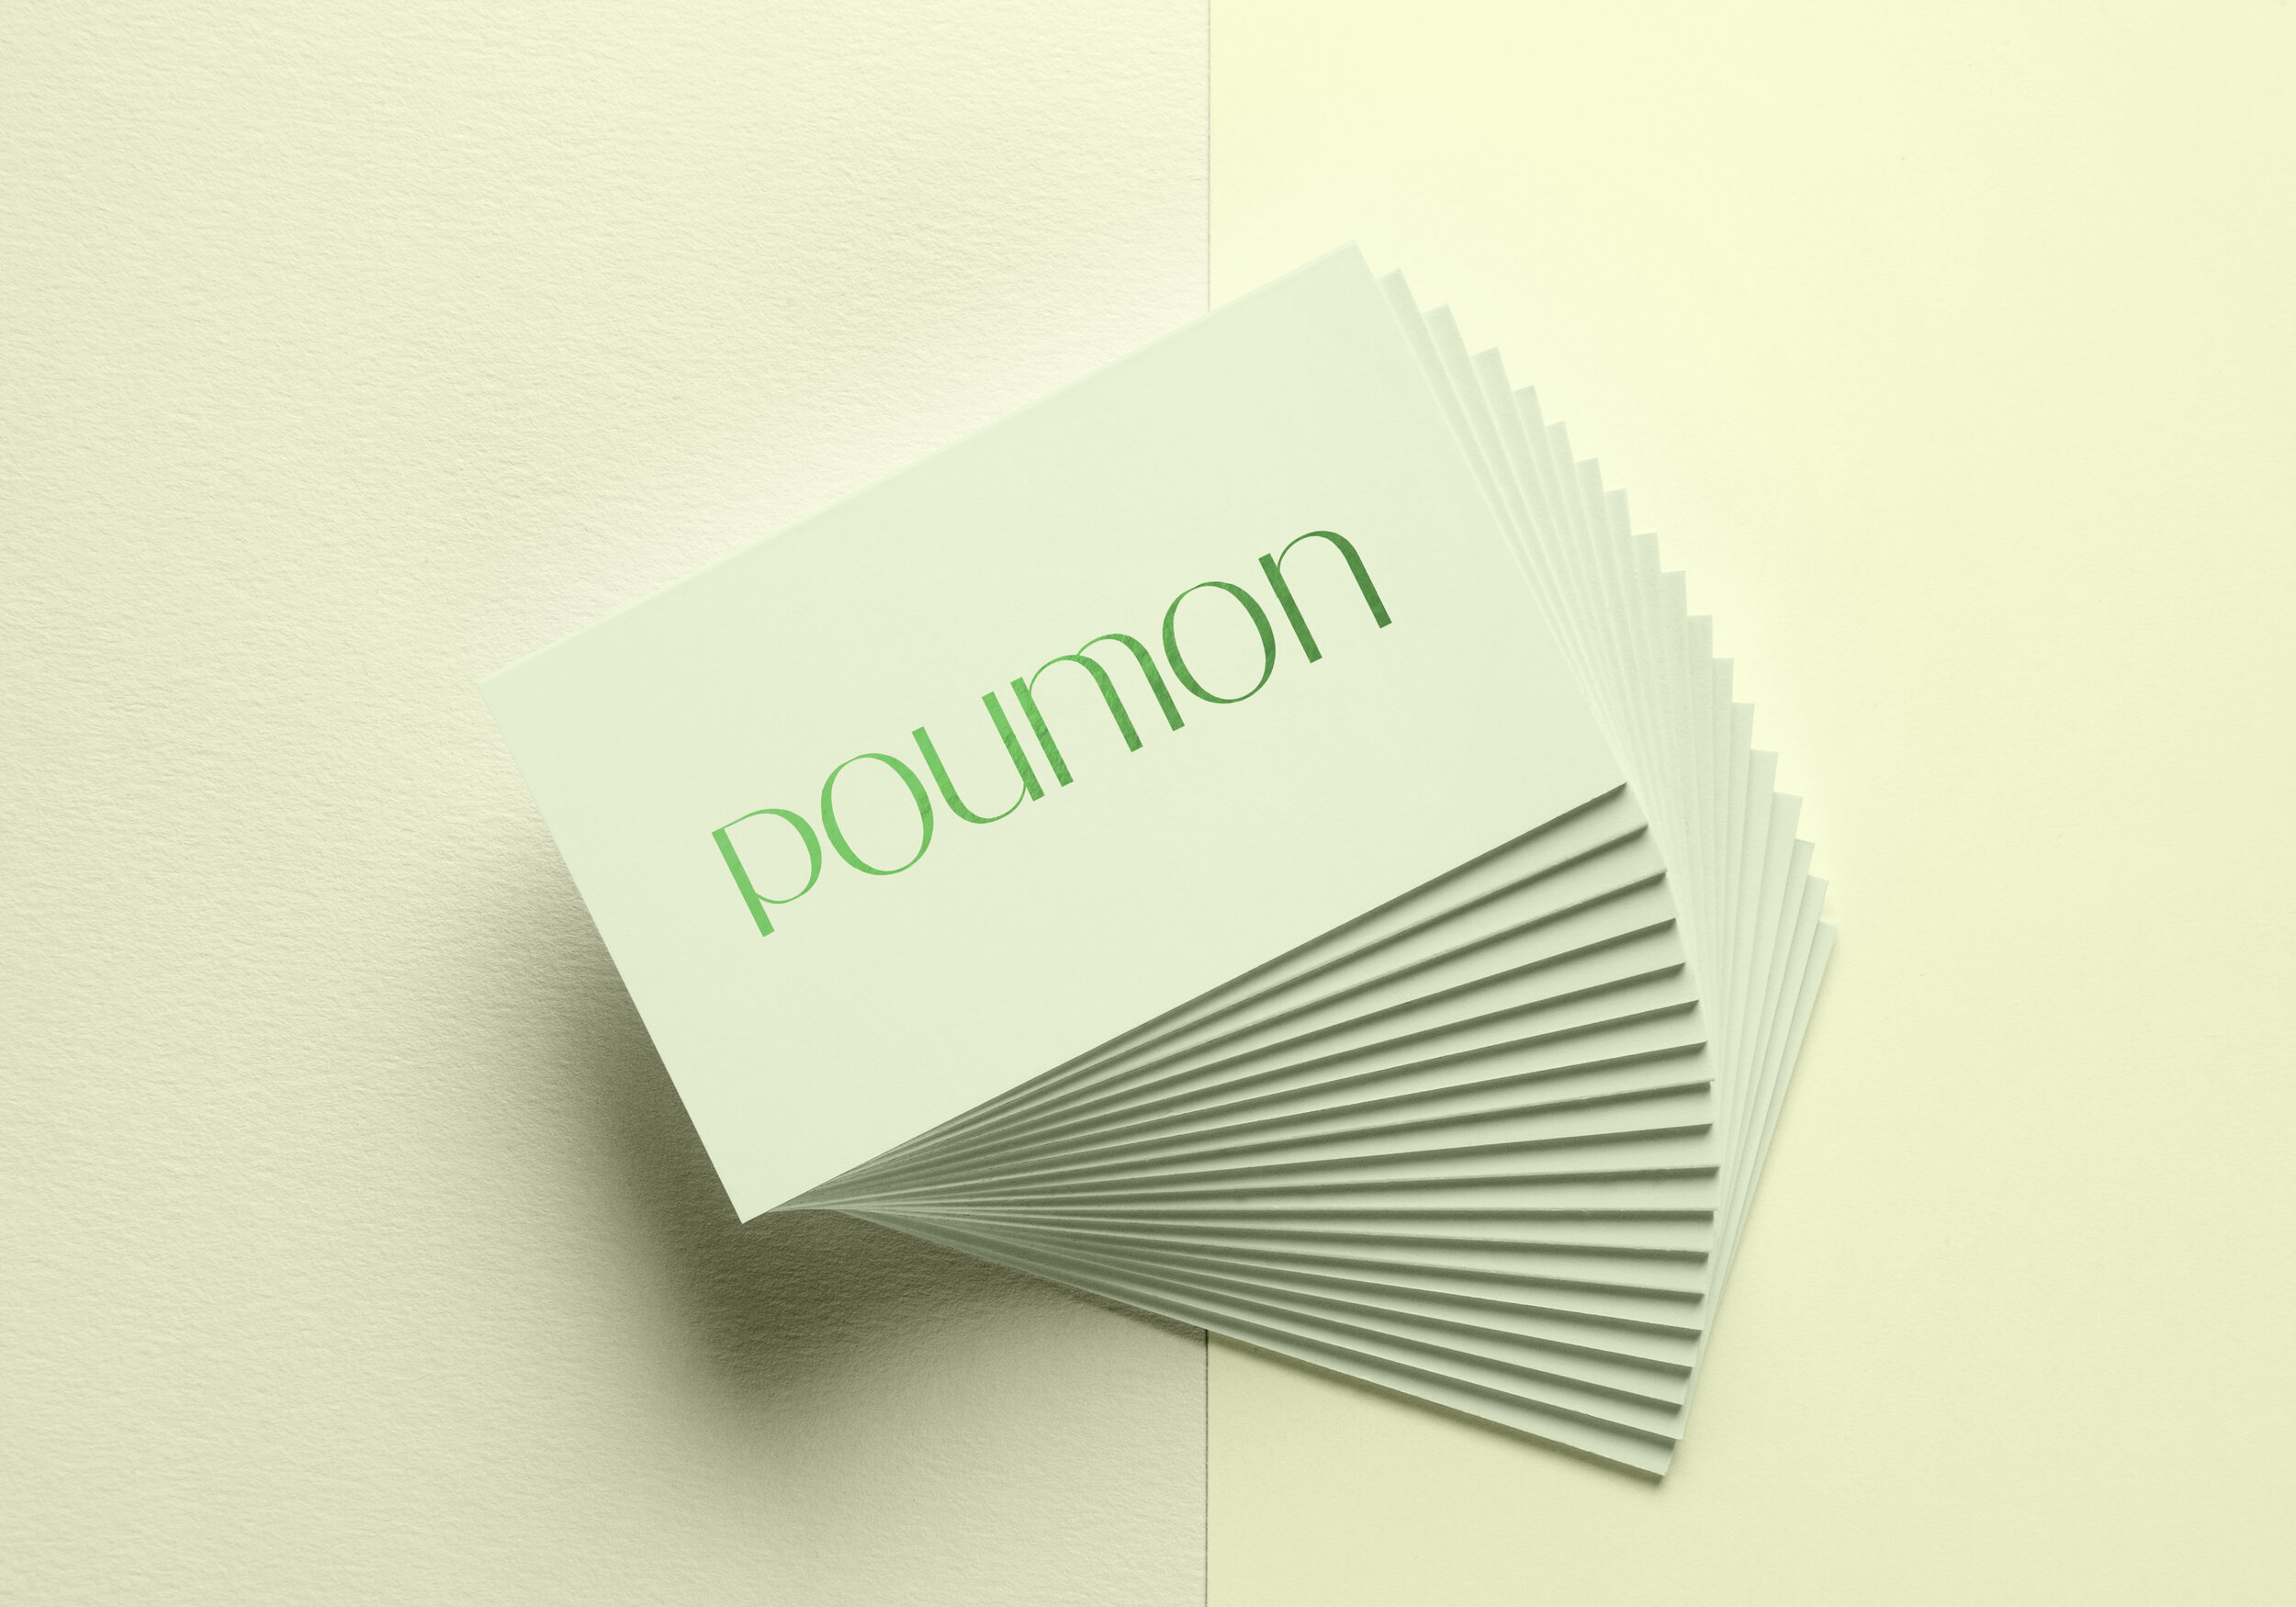 Poumon-Site-JPEG